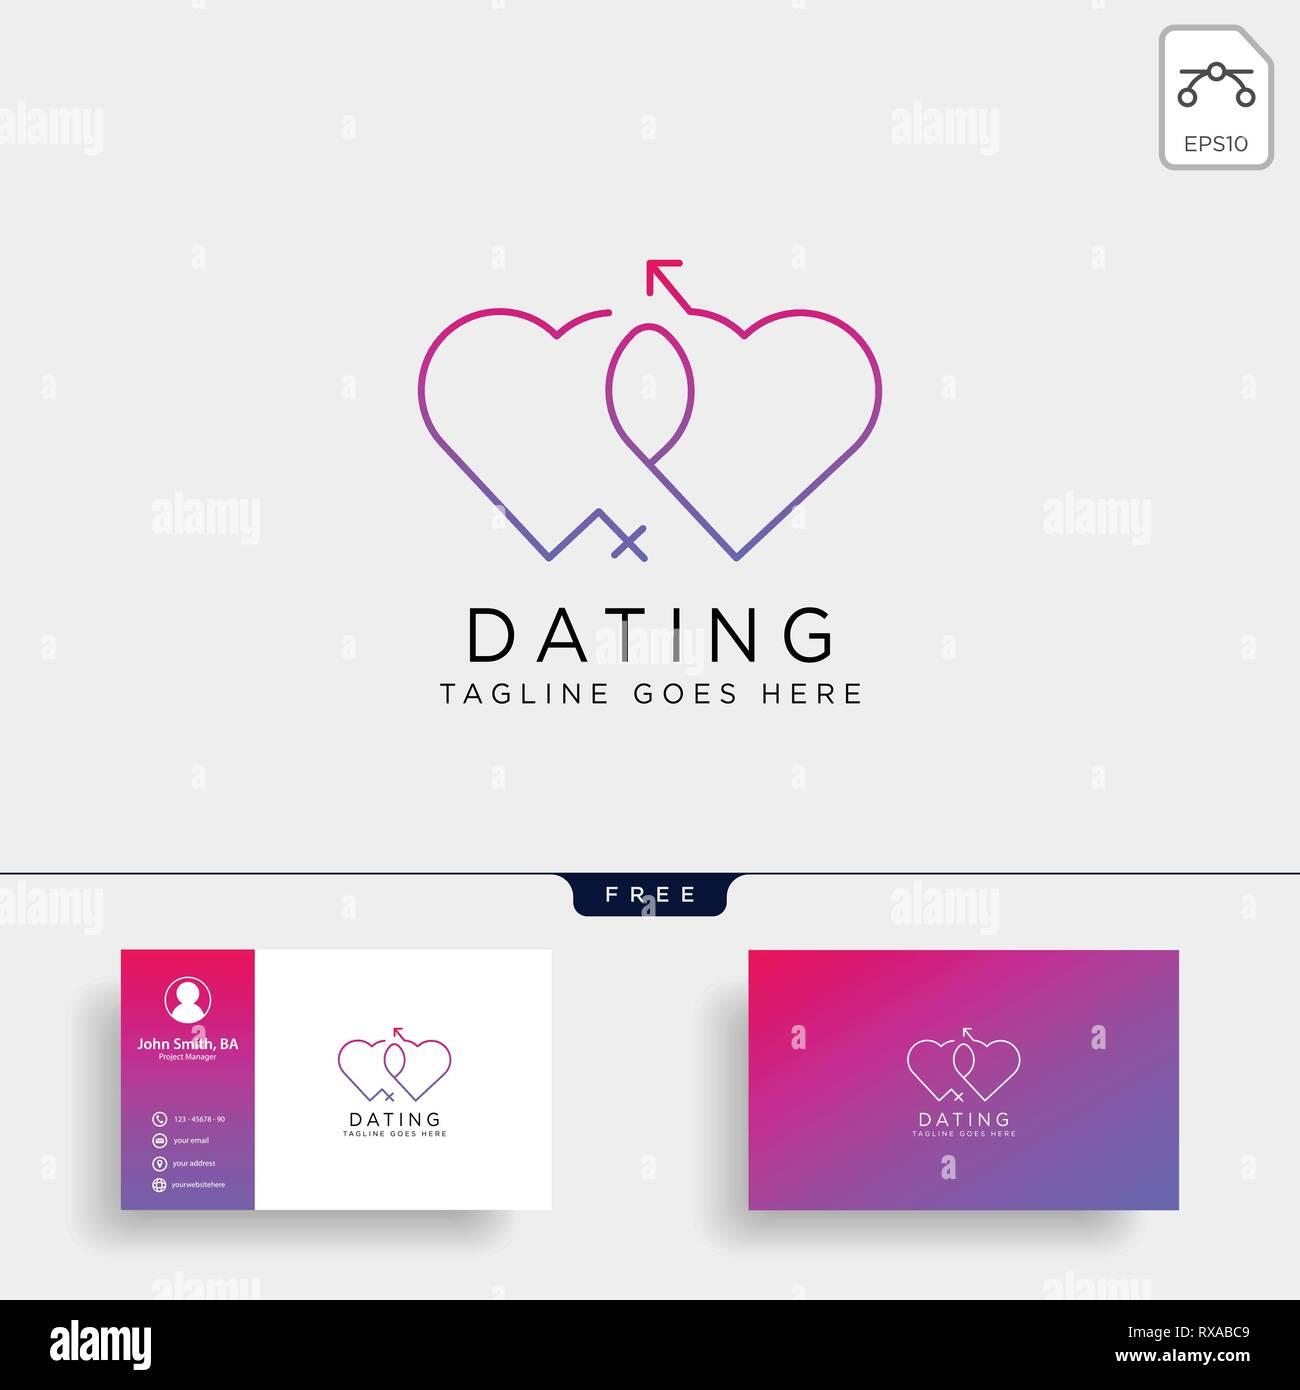 Online anime dating simulointi